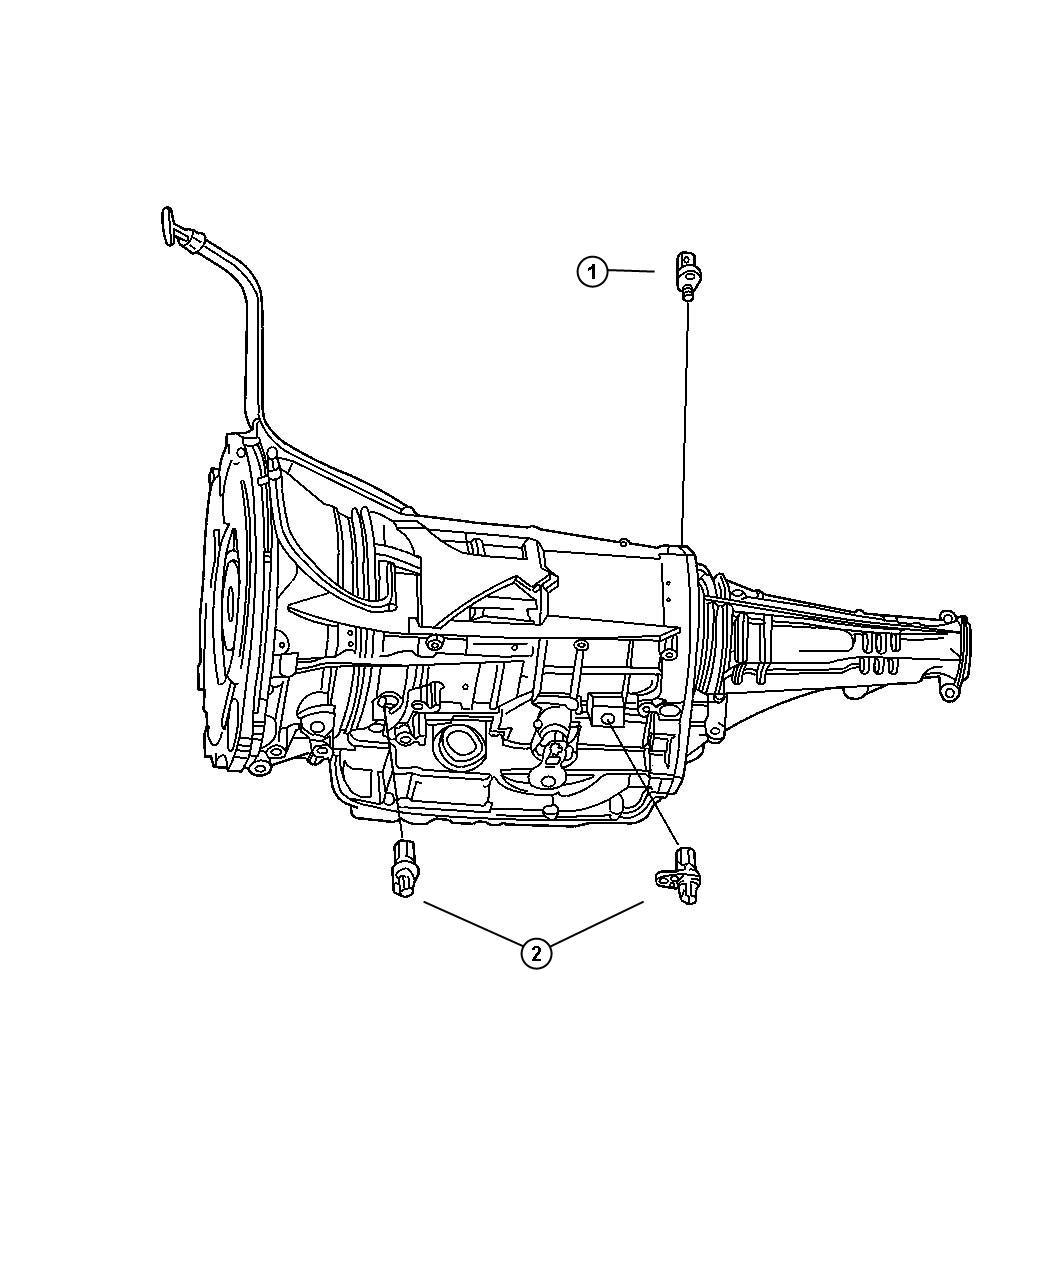 Chrysler 300 Sensor. Transmission input speed. Input